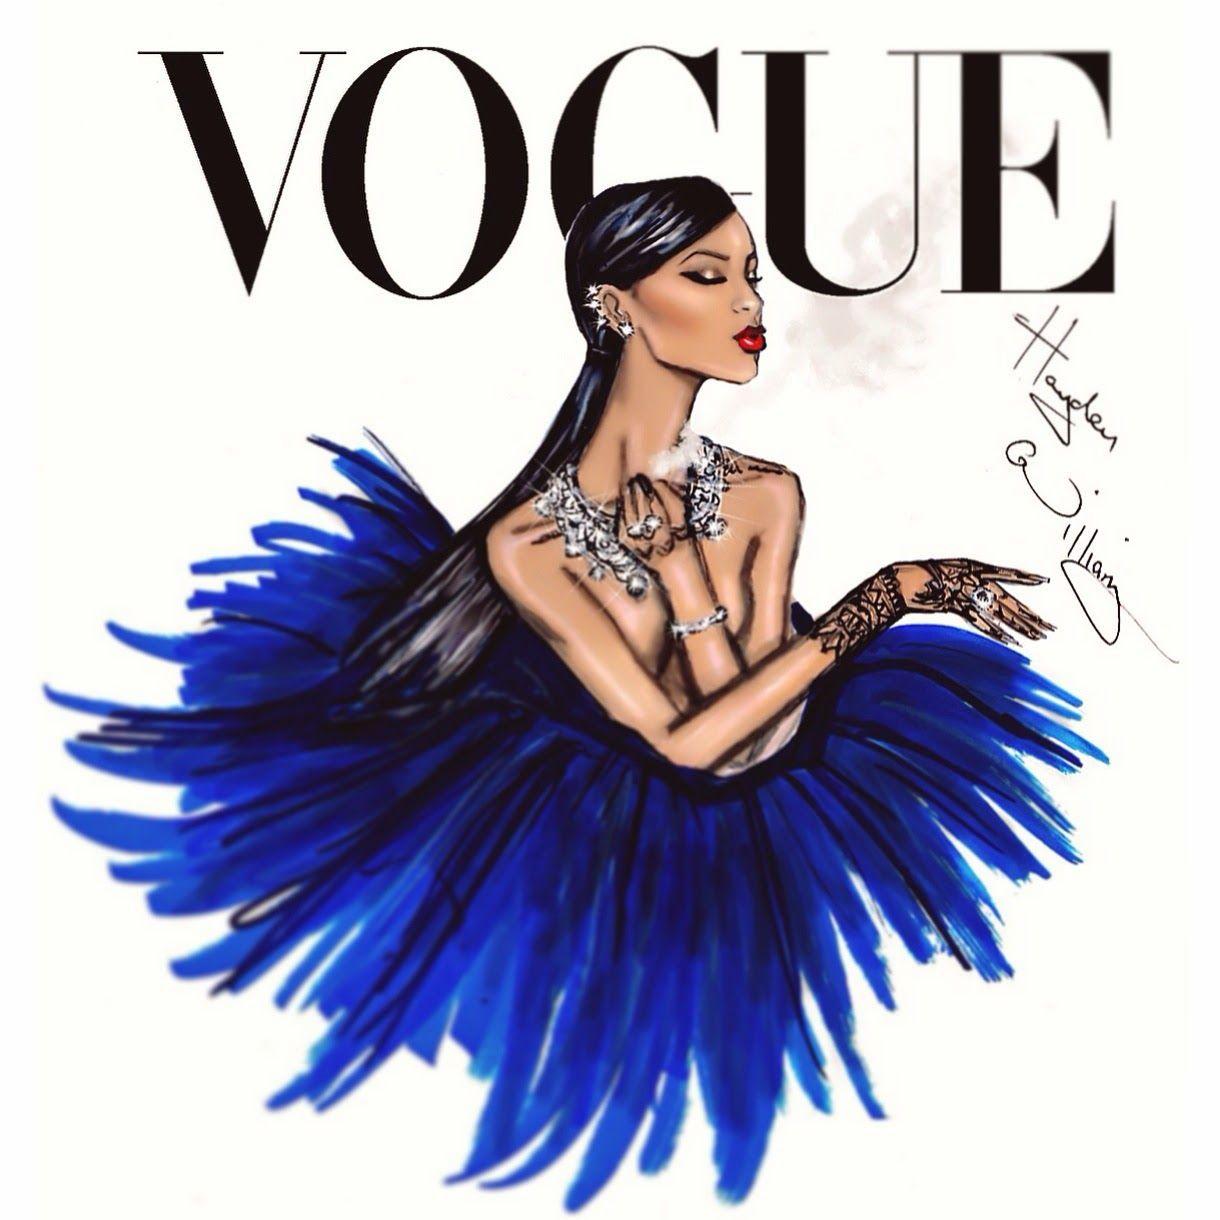 #Hayden Williams Fashion Illustrations #Rihanna 'Diamond Ball' by Hayden Williams